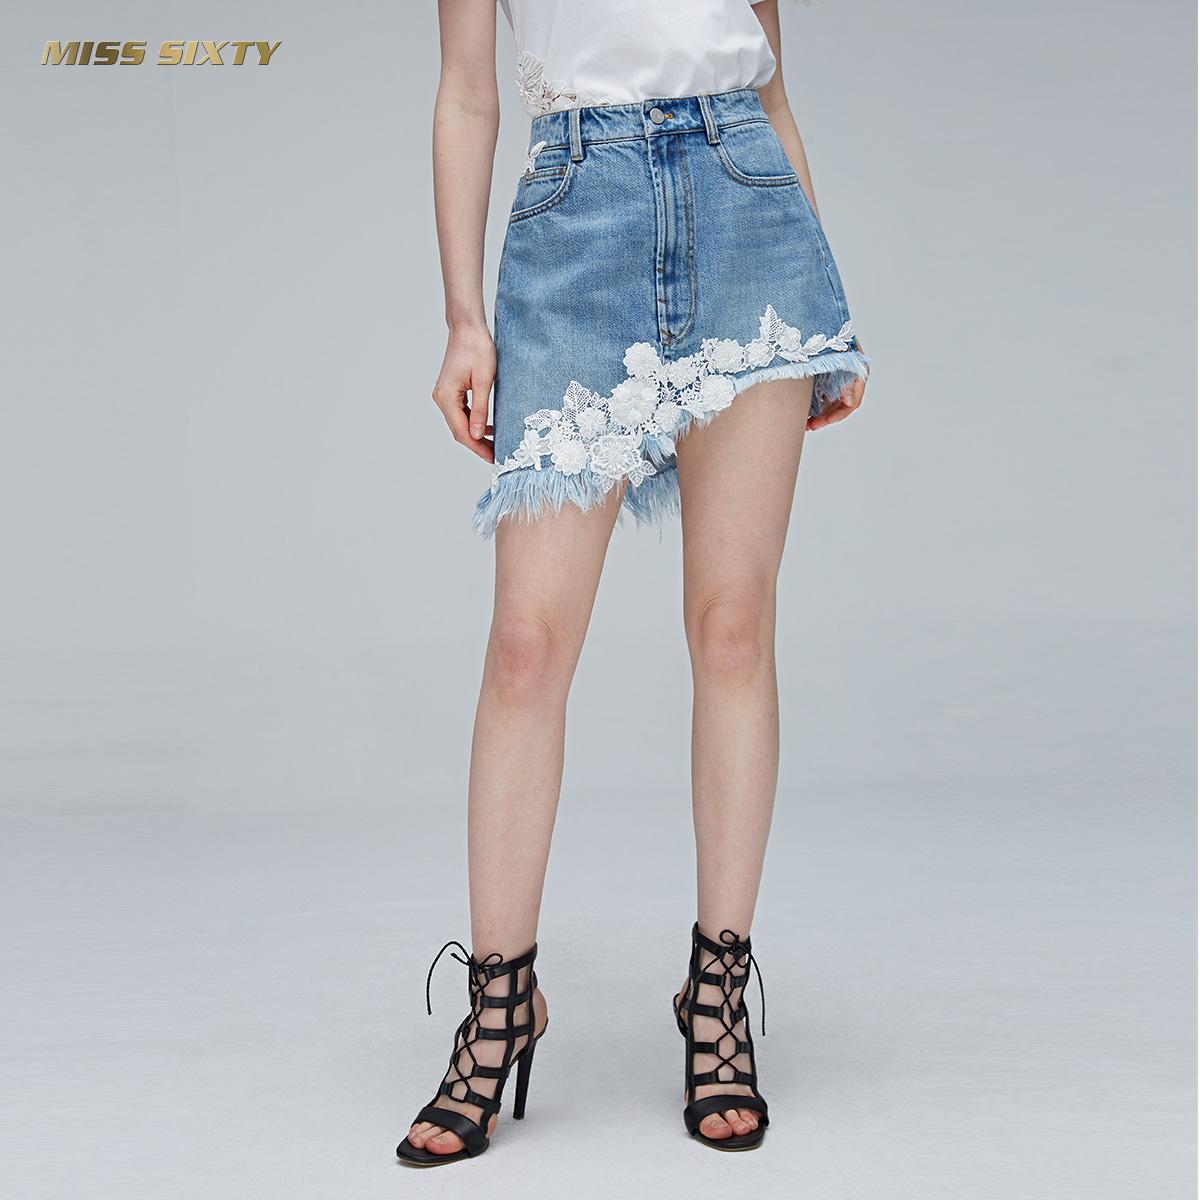 B Miss Sixty2018新款夏季绣花短裙不规则牛仔裙半身裙女